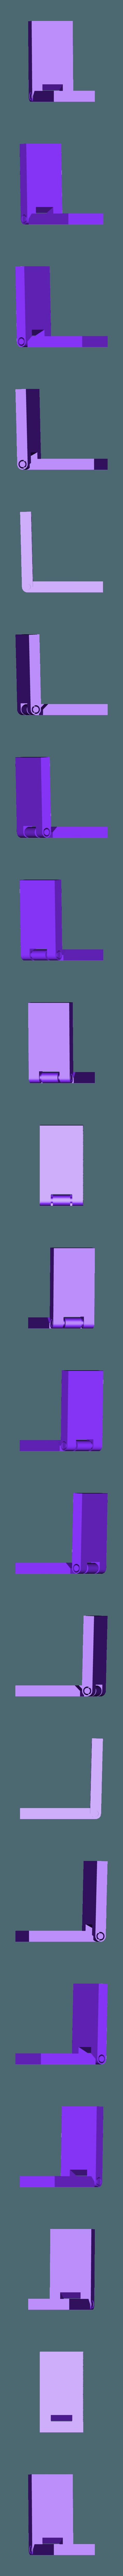 Charniere assemblee.STL Download free STL file Hinge / hinge • 3D print design, Ni-no